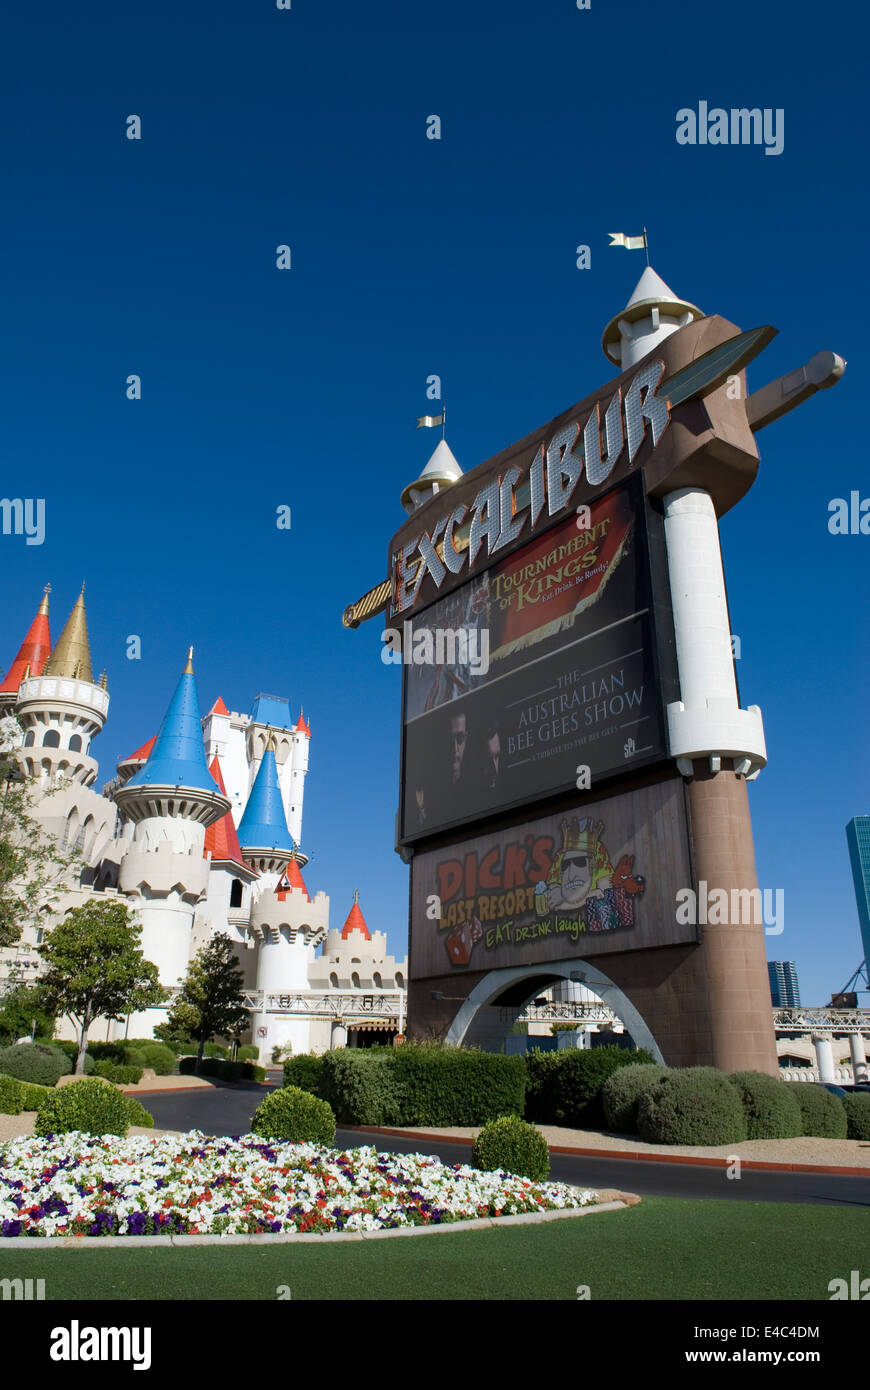 Excalibur Hotel and Casino Las Vegas Nevada USA Stock Photo